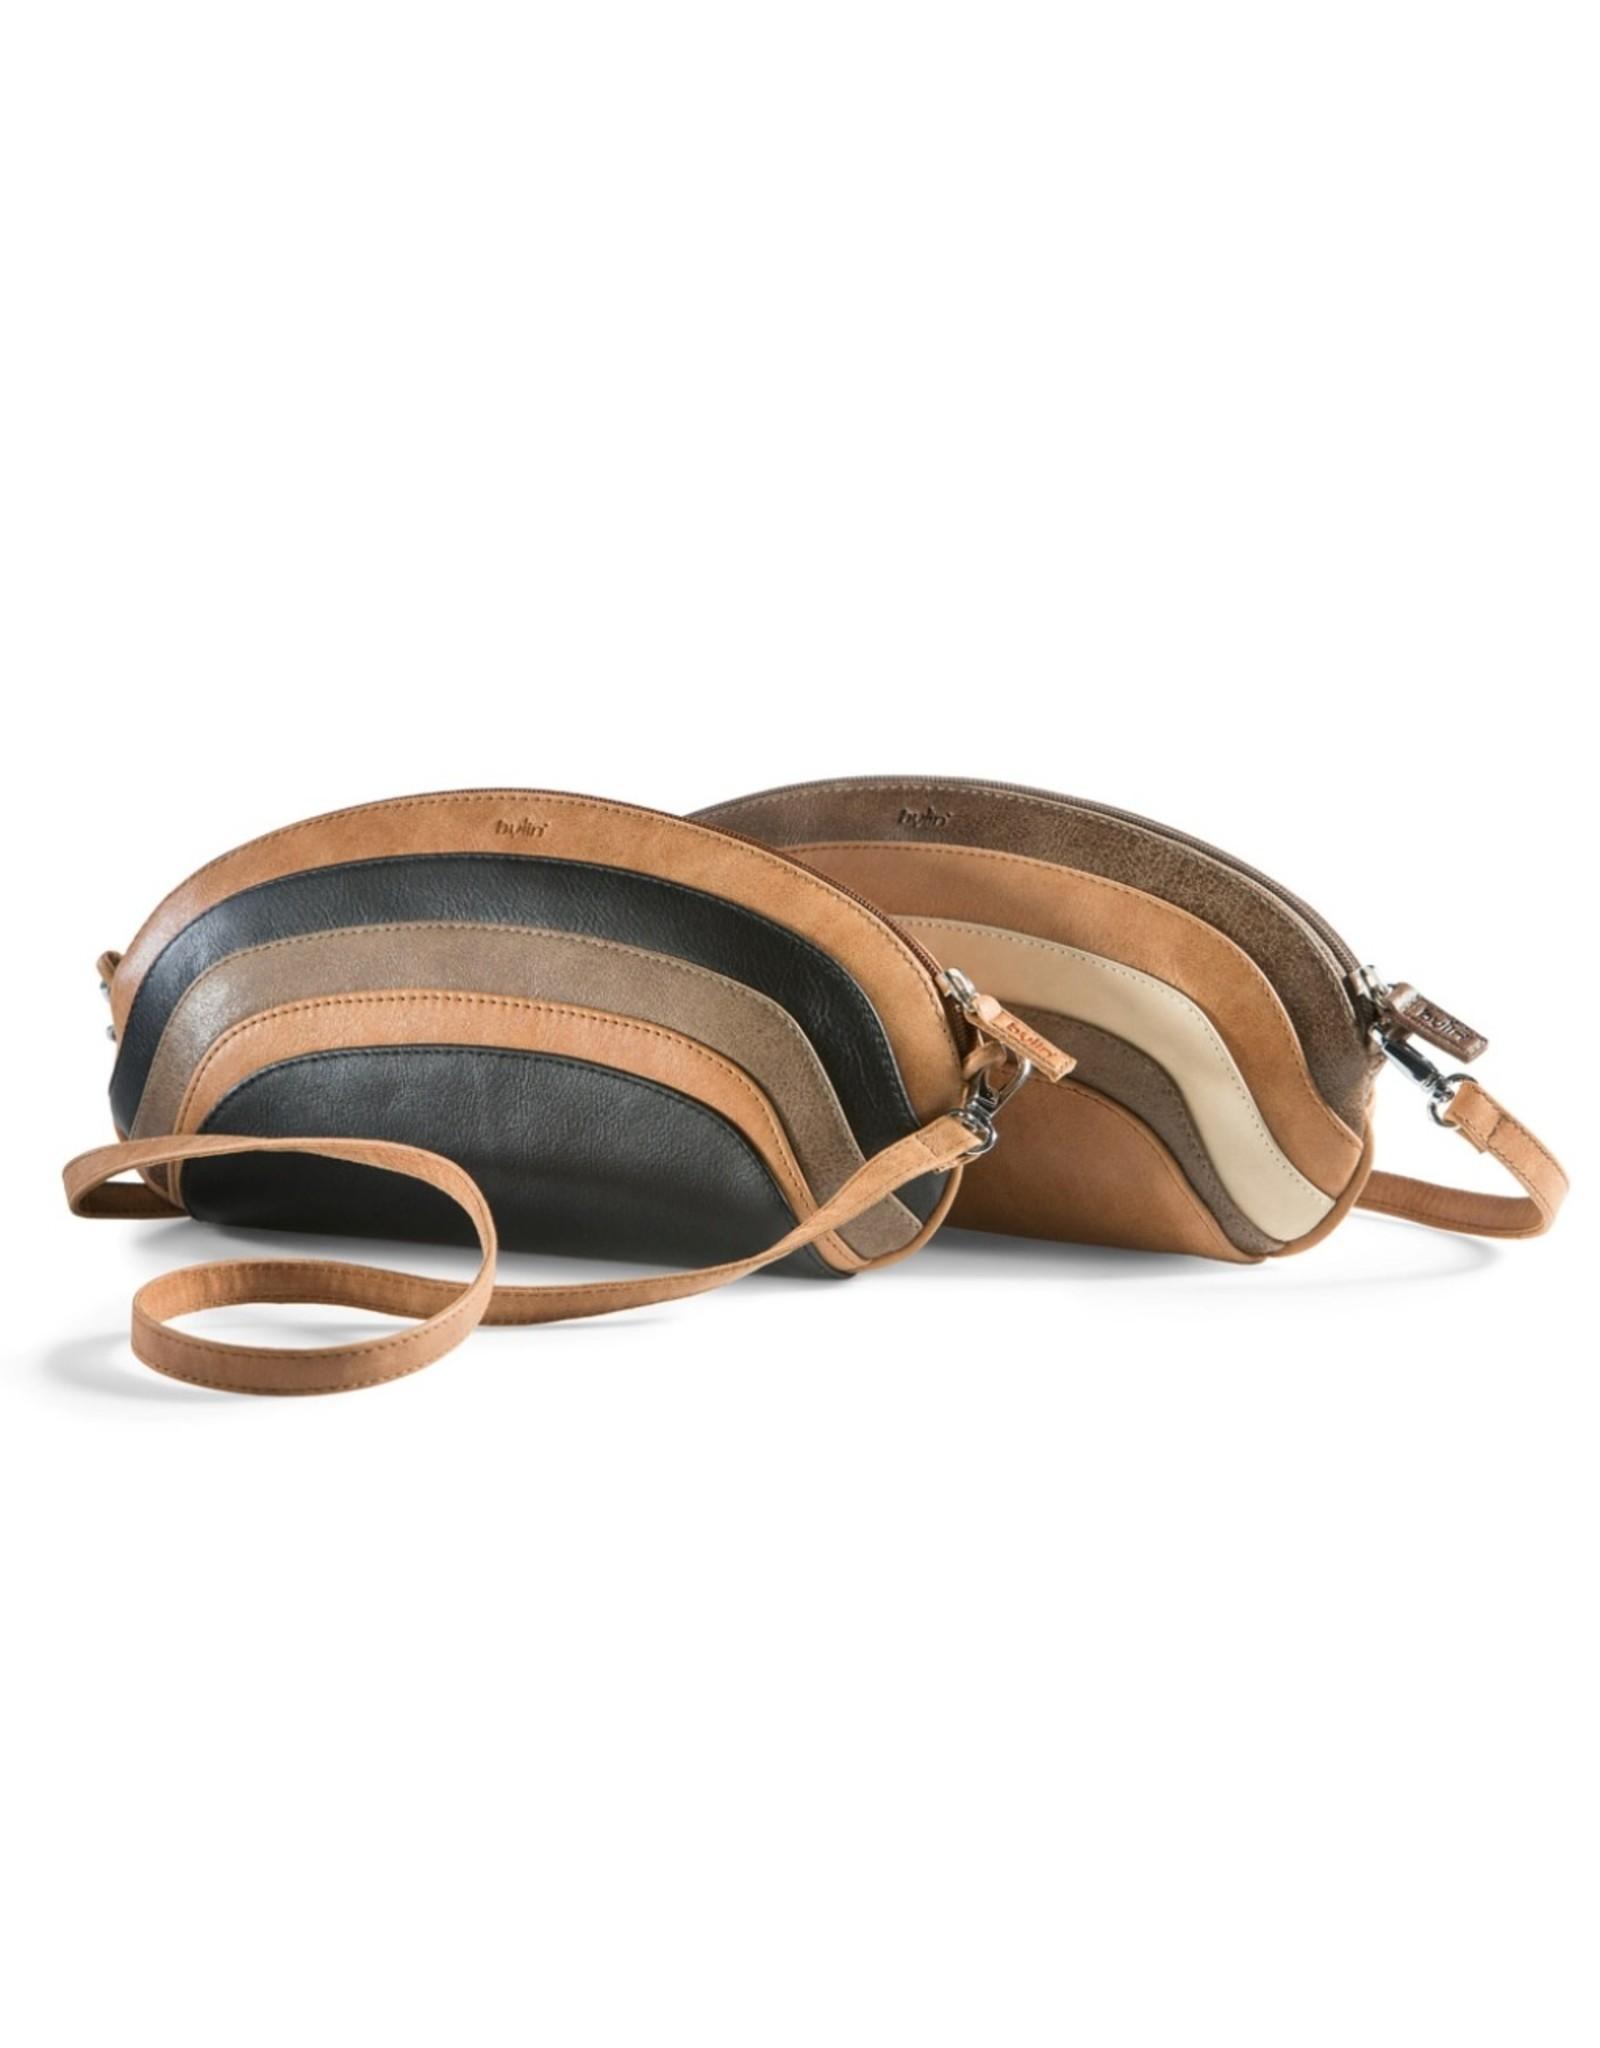 by-Lin Dutch Design Leather bags - by-Lin Dutch Design Rainbow Leather shoulder bag